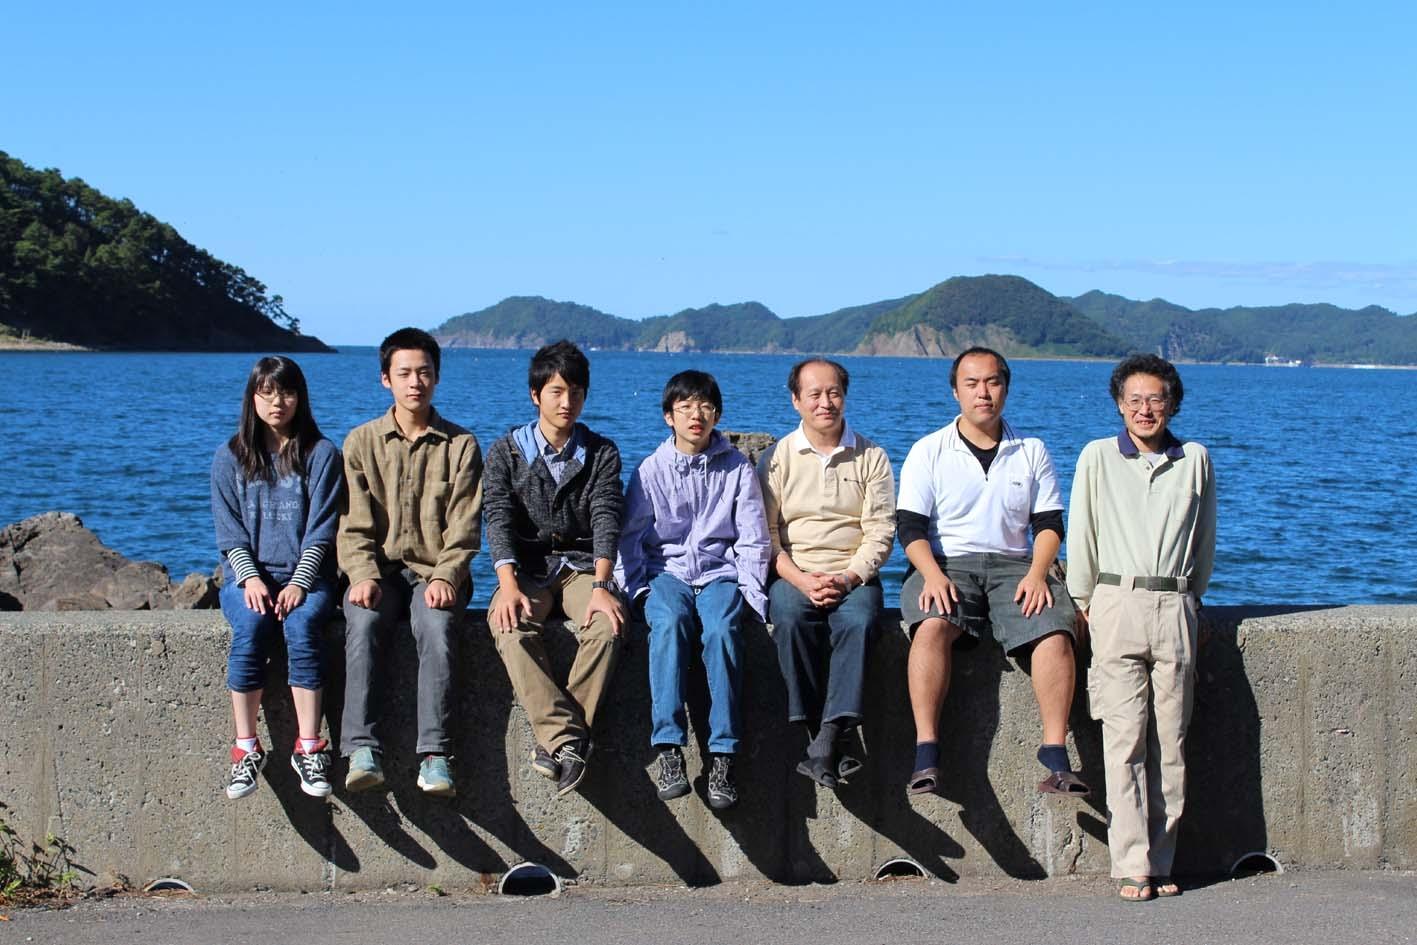 http://www.ige.tohoku.ac.jp/mirai/news/upload_items/201210/IMG_0075s.JPG